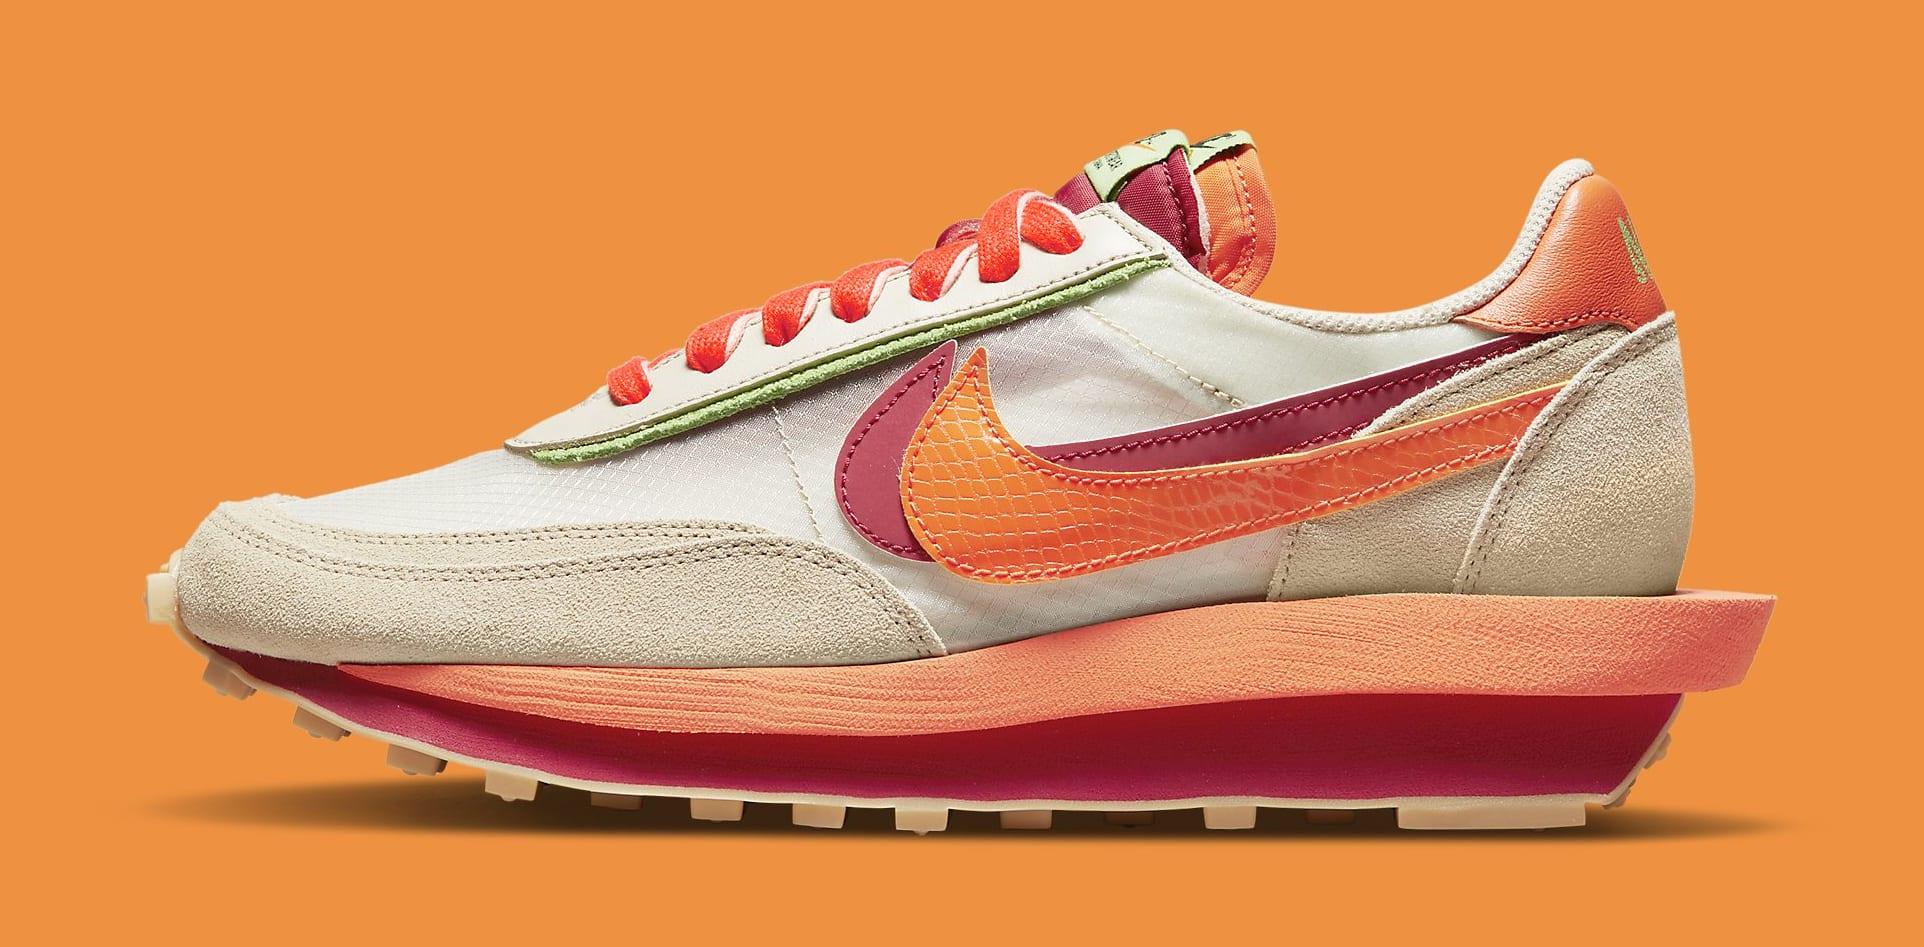 Sacai x Clot x Nike LDWaffle DH1347-100 Lateral